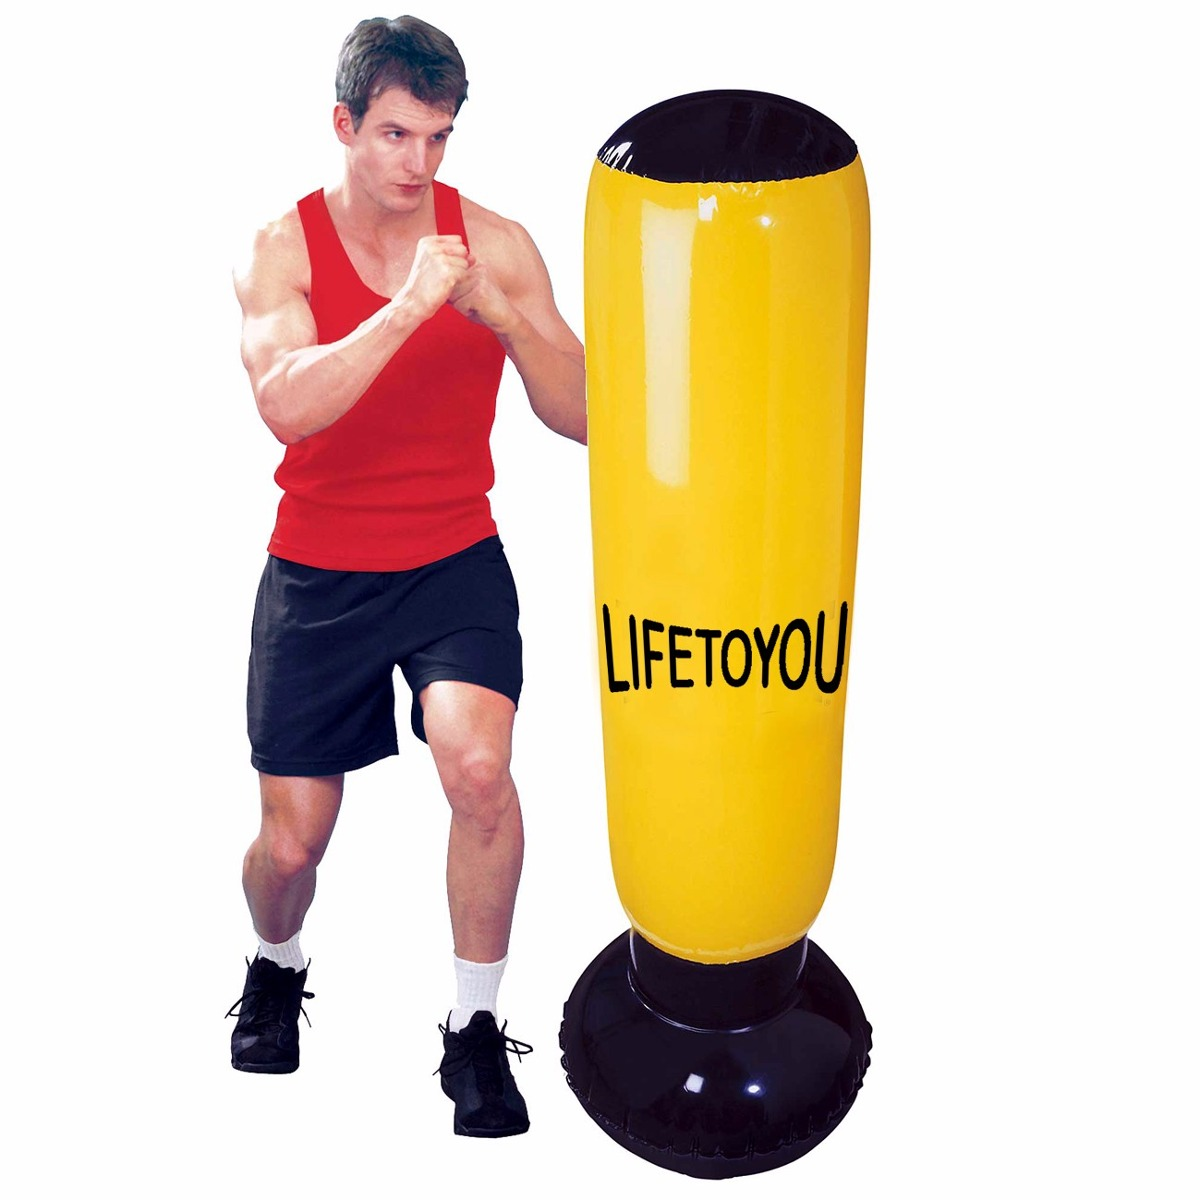 db6f40ced saco de pancada inflavel amarelo luta treino boxe mma. Carregando zoom.